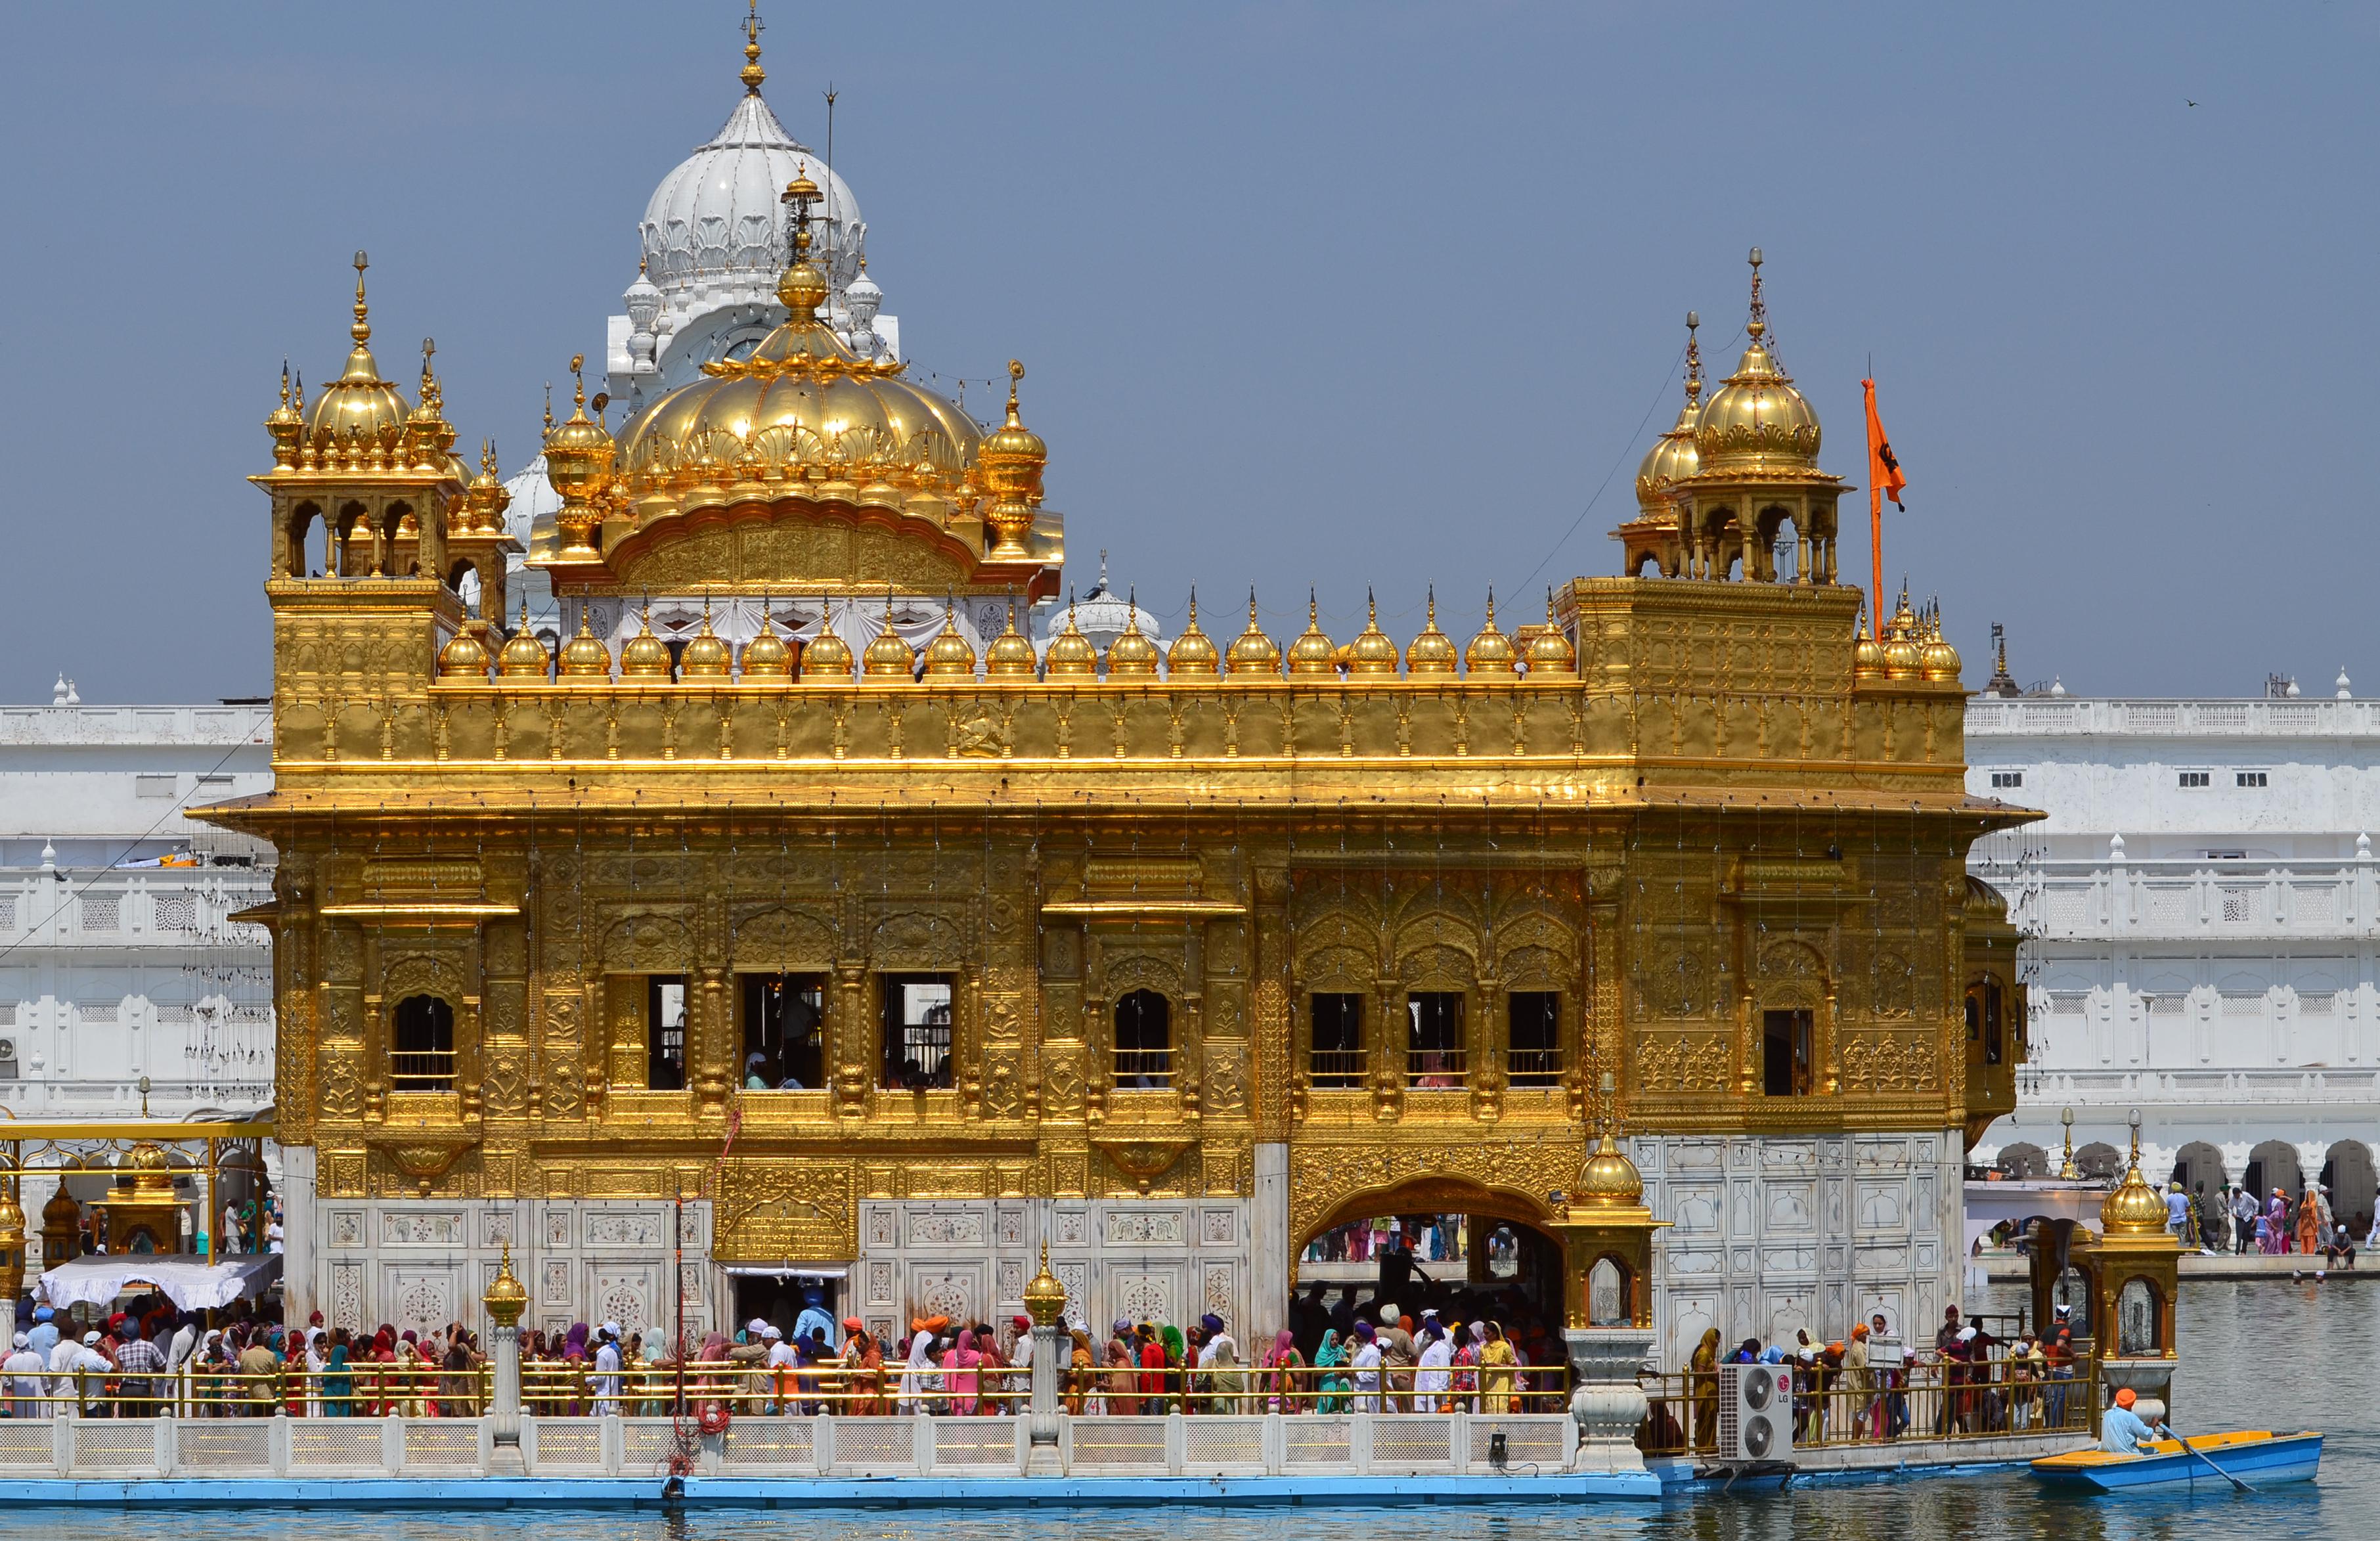 Gurudwara Harmandir Sahib - The Golden Temple, Amritsar, India